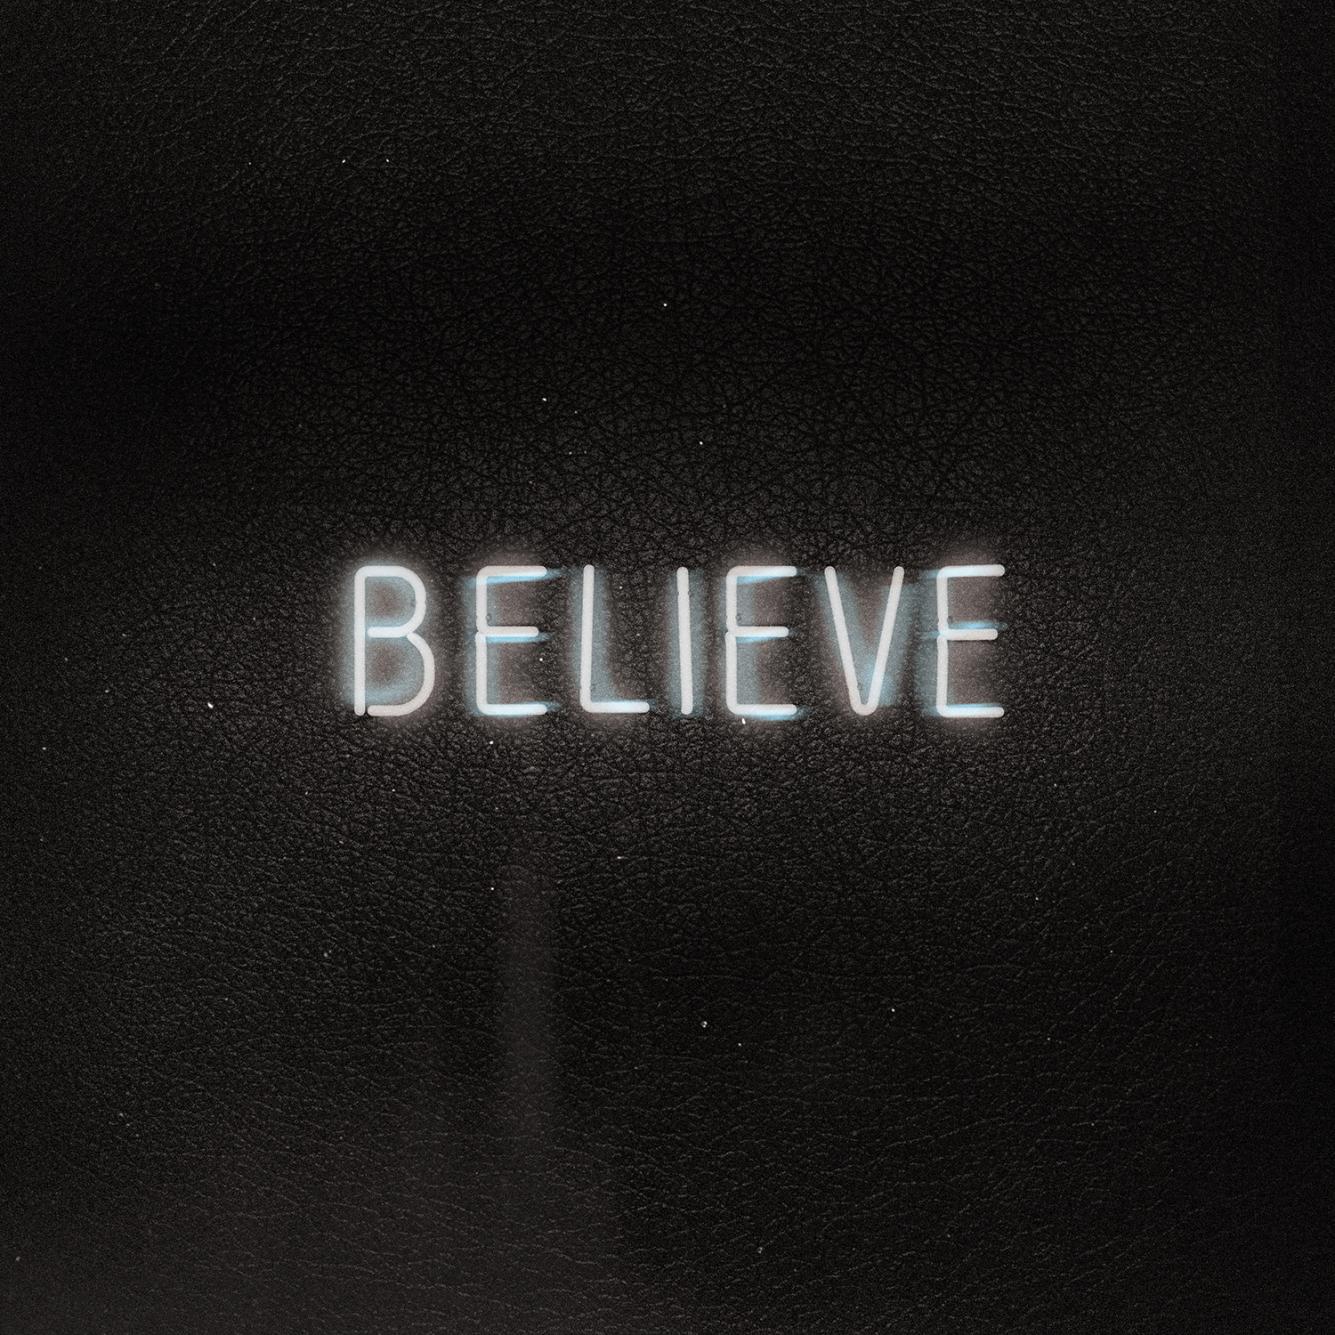 Mumfordsons believe